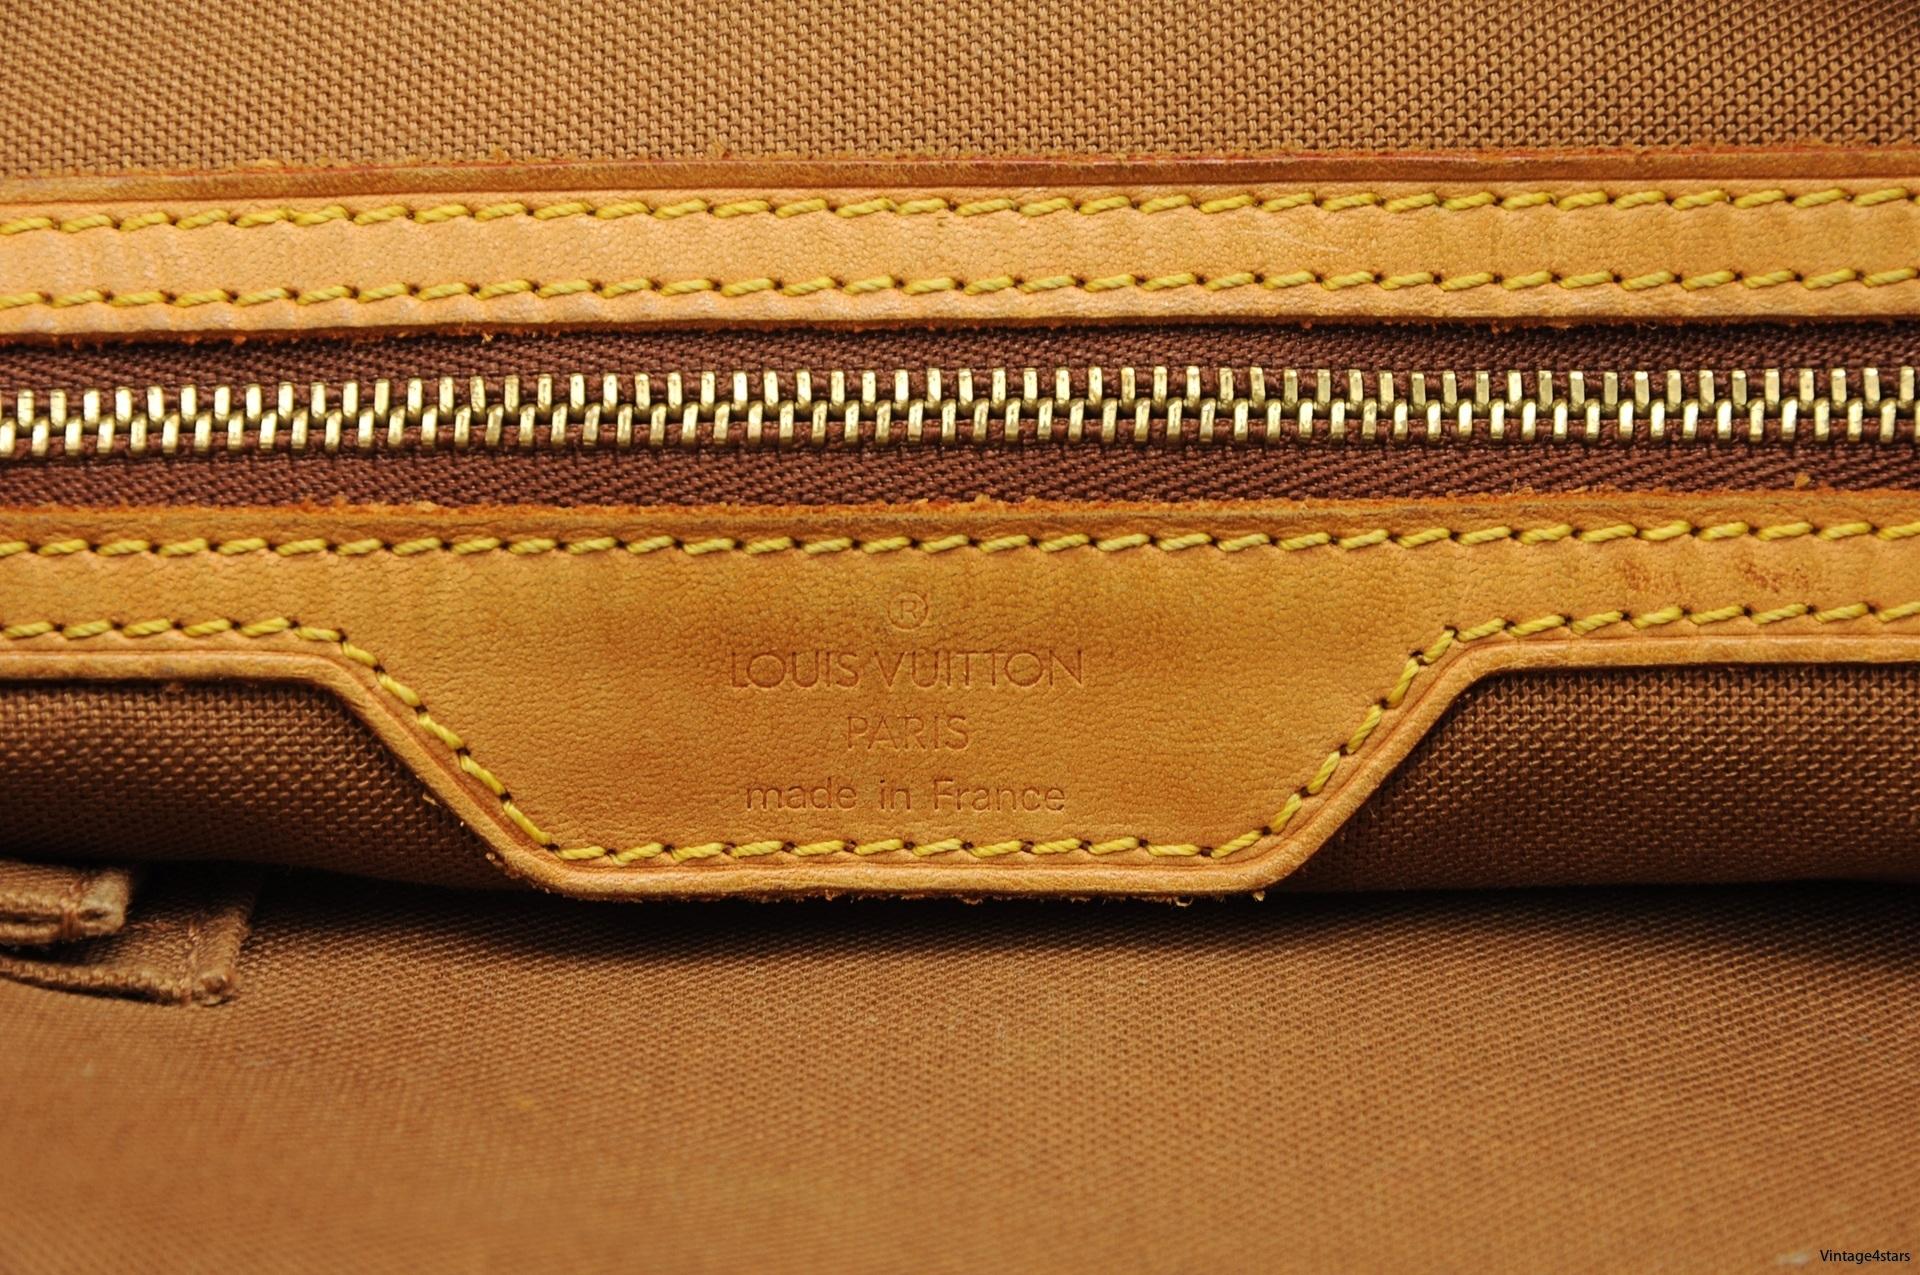 Louis Vuitton Cabas Mezzo 8